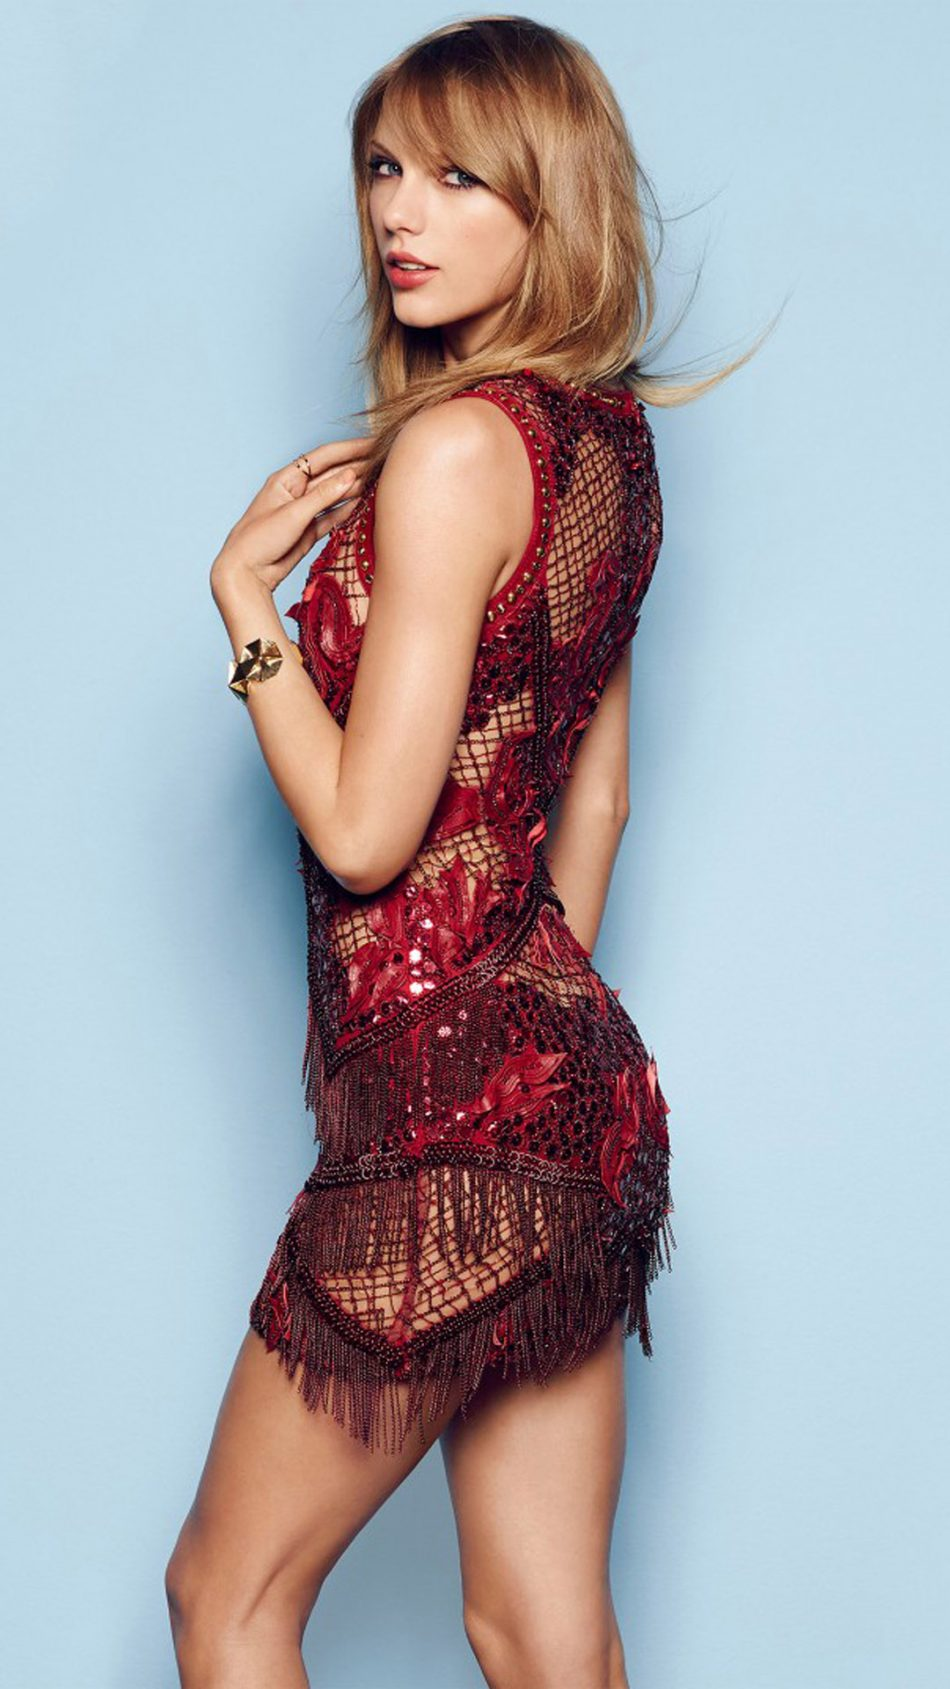 Beautiful Taylor Swift 2018 HD Mobile Wallpaper